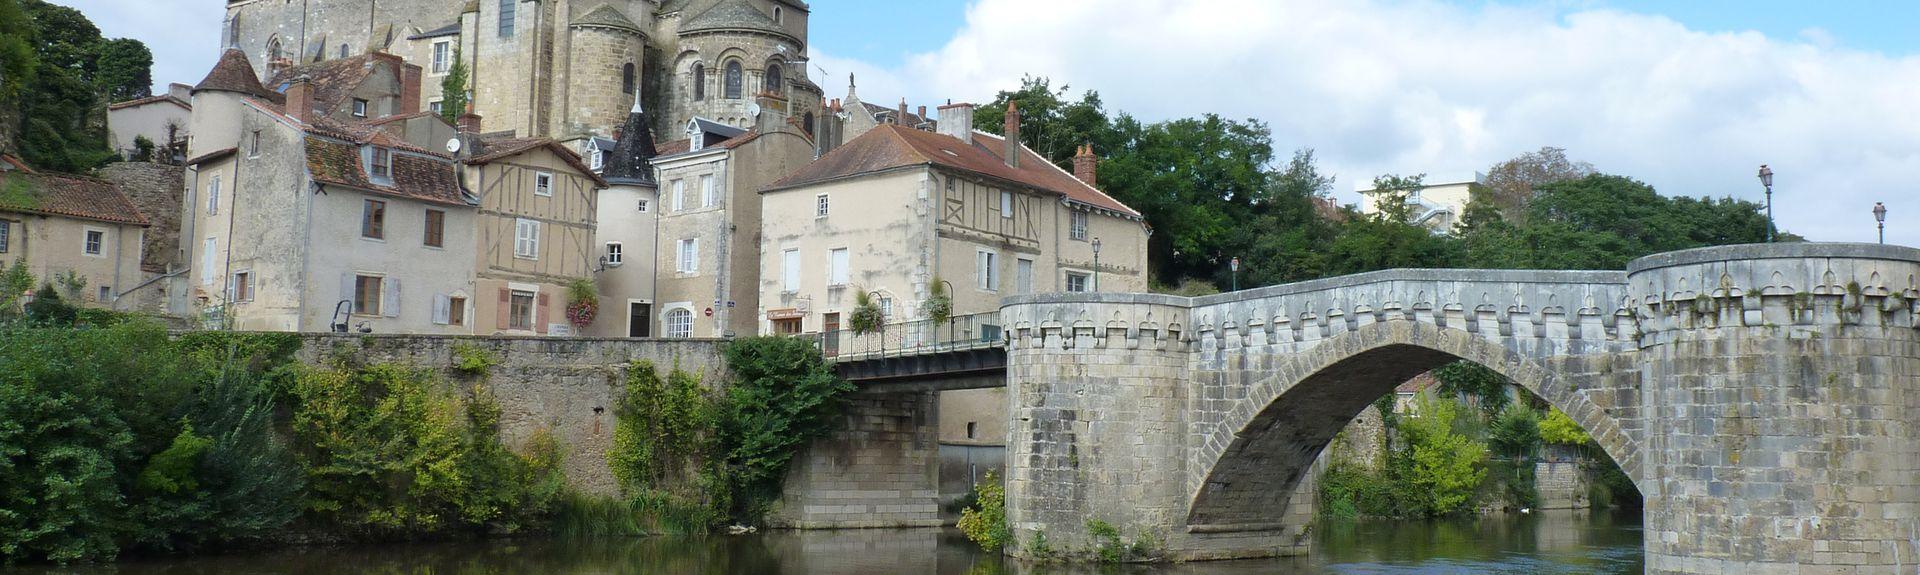 Arnac-la-Poste, France